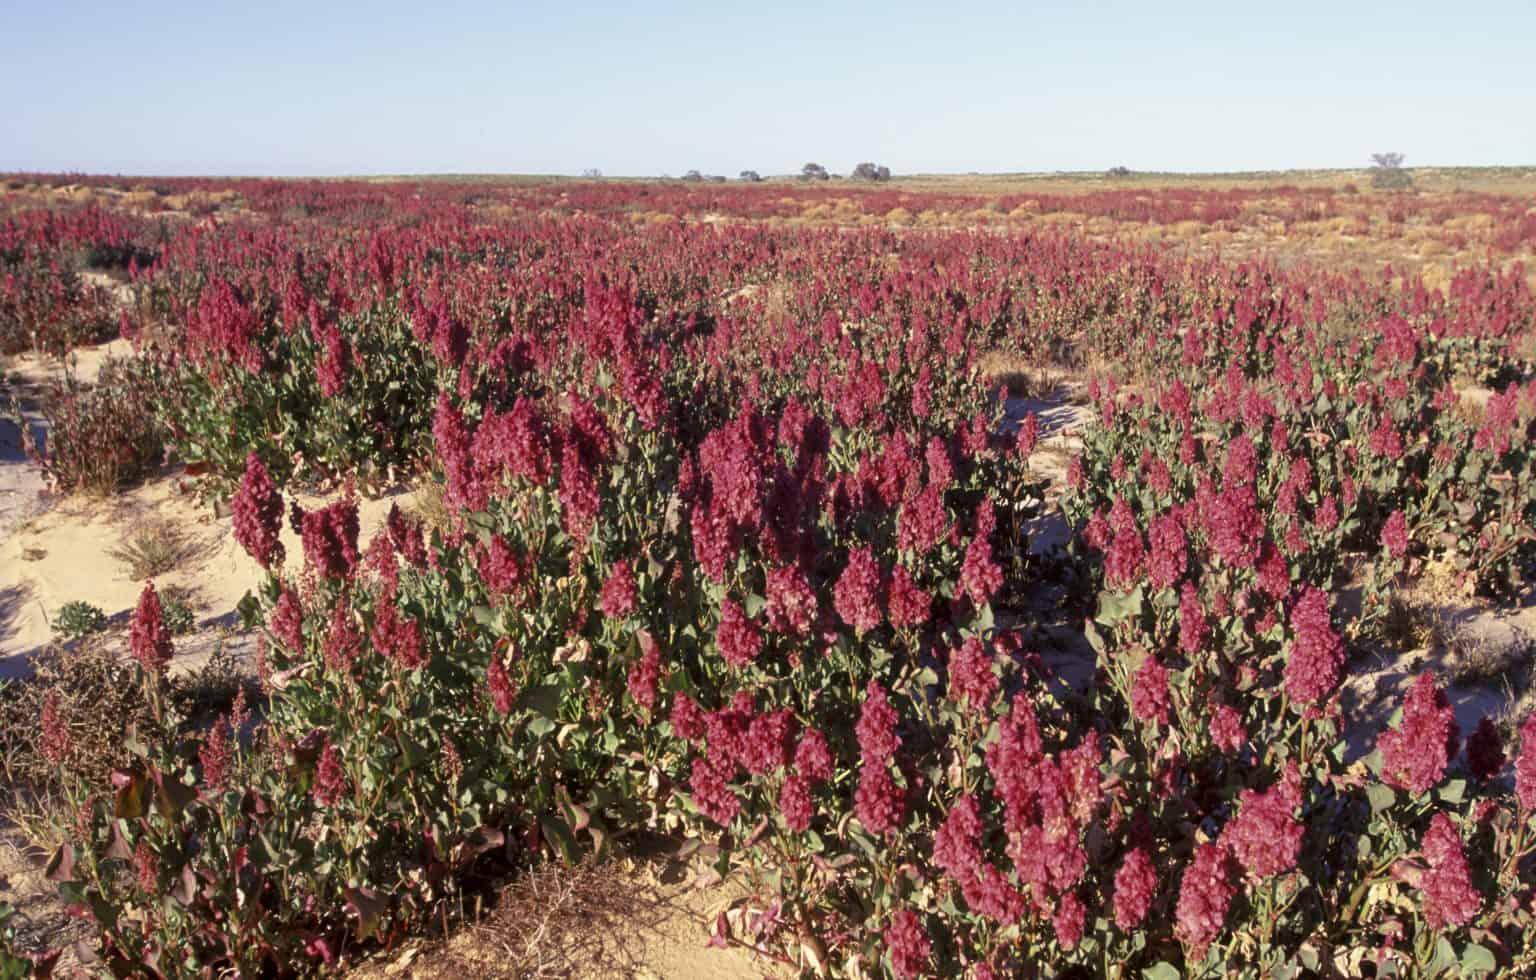 Outback blooms in the Strzelecki Desert